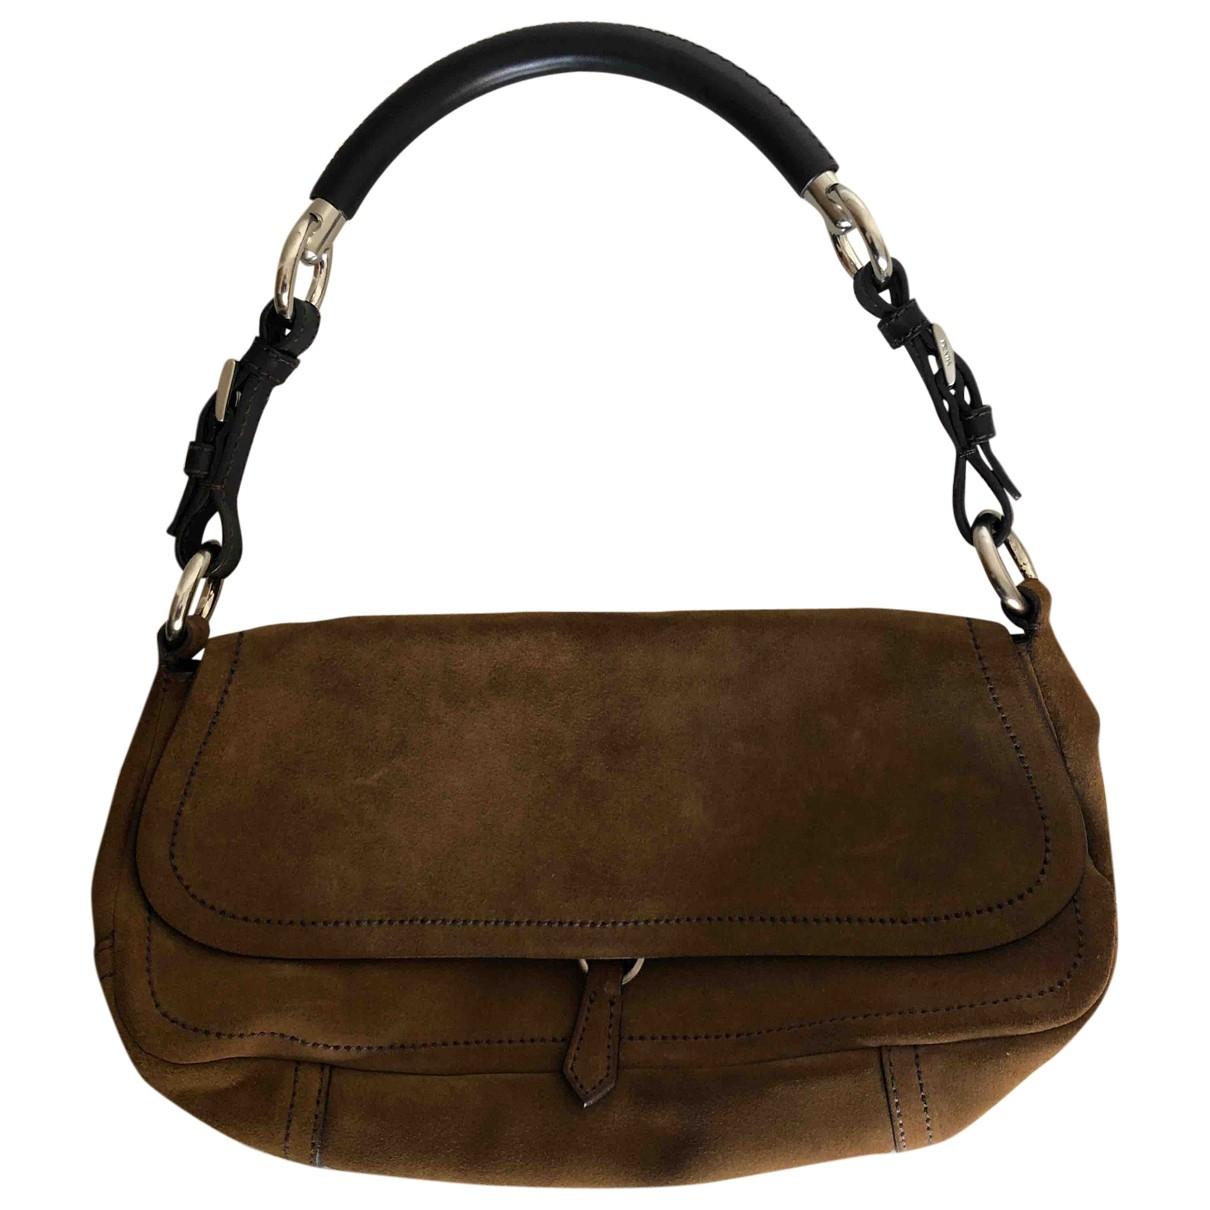 Prada \N Camel Suede handbag for Women \N